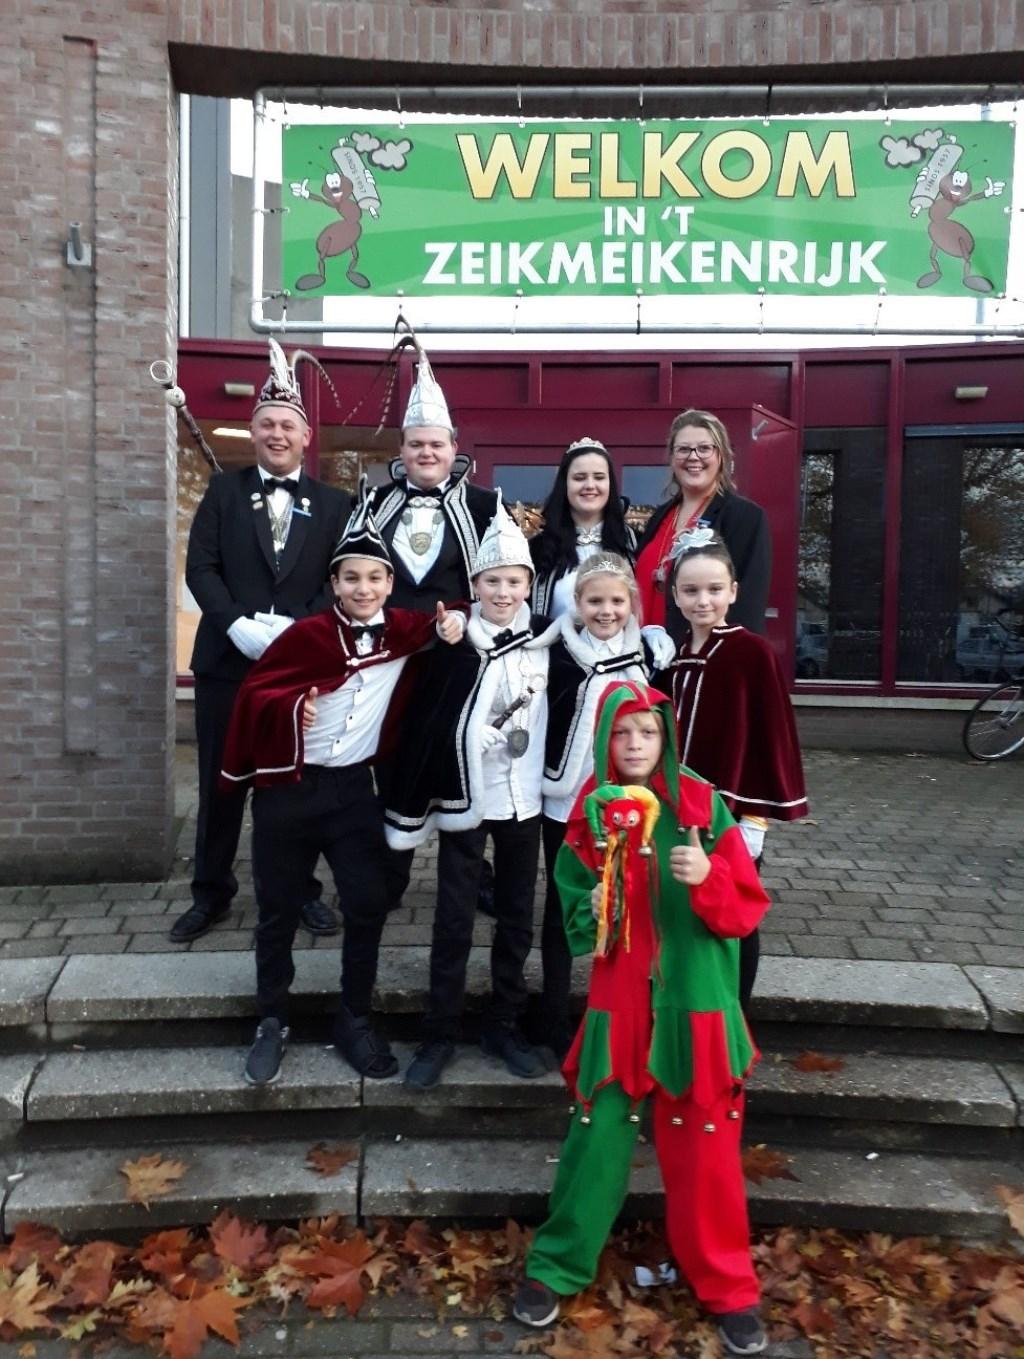 Prins Kevin van den Berg I en Prinses Chanel Rutten met adjudant Roel Nabuurs en page Lisa Gyzen van de Zeikmeiken, Sint Anthonis.   © Kliknieuws De Maas Driehoek